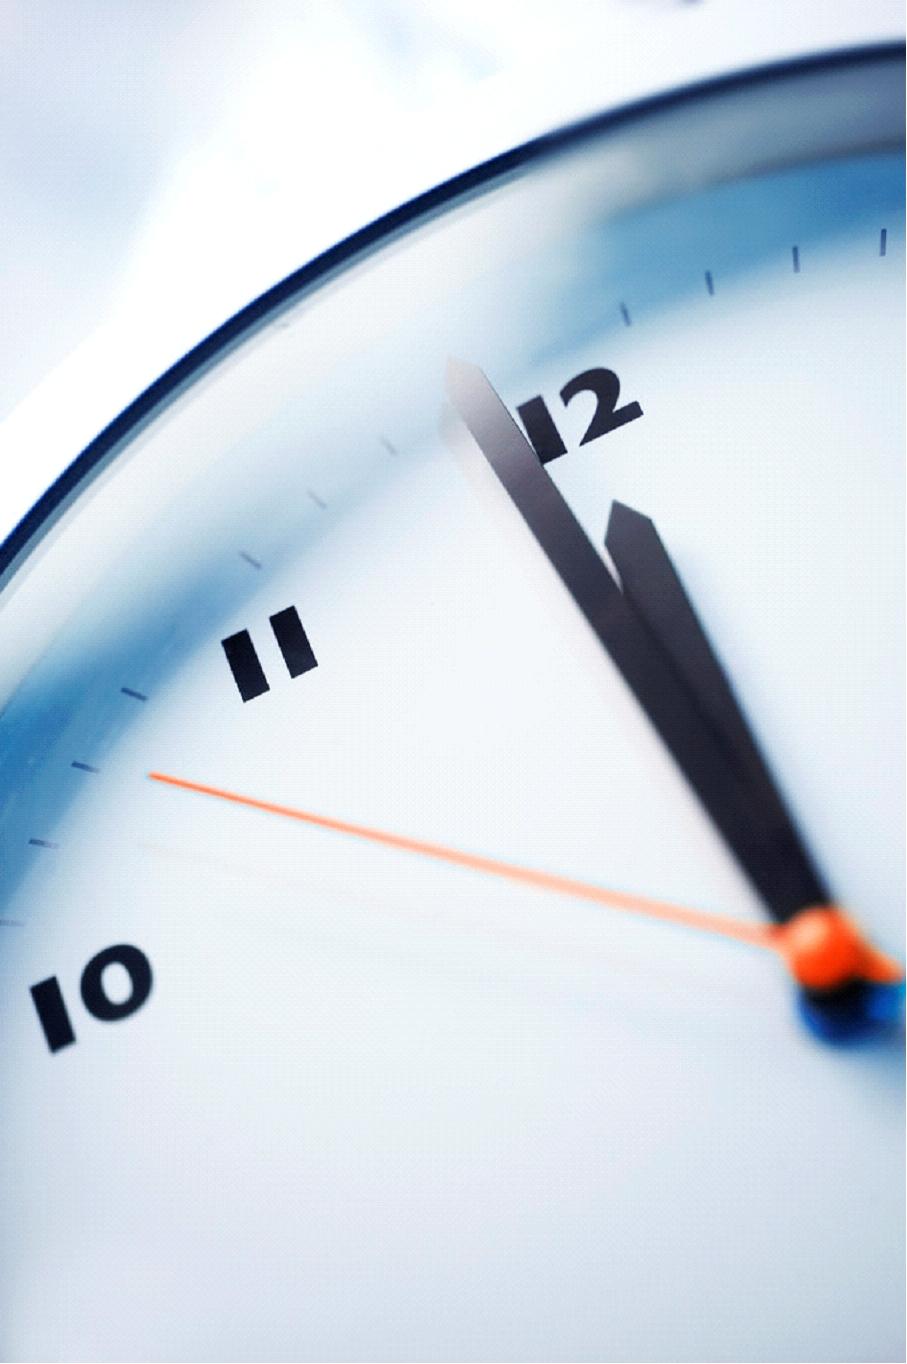 http://www.registrogenealogico.cl/img/reloj.jpg